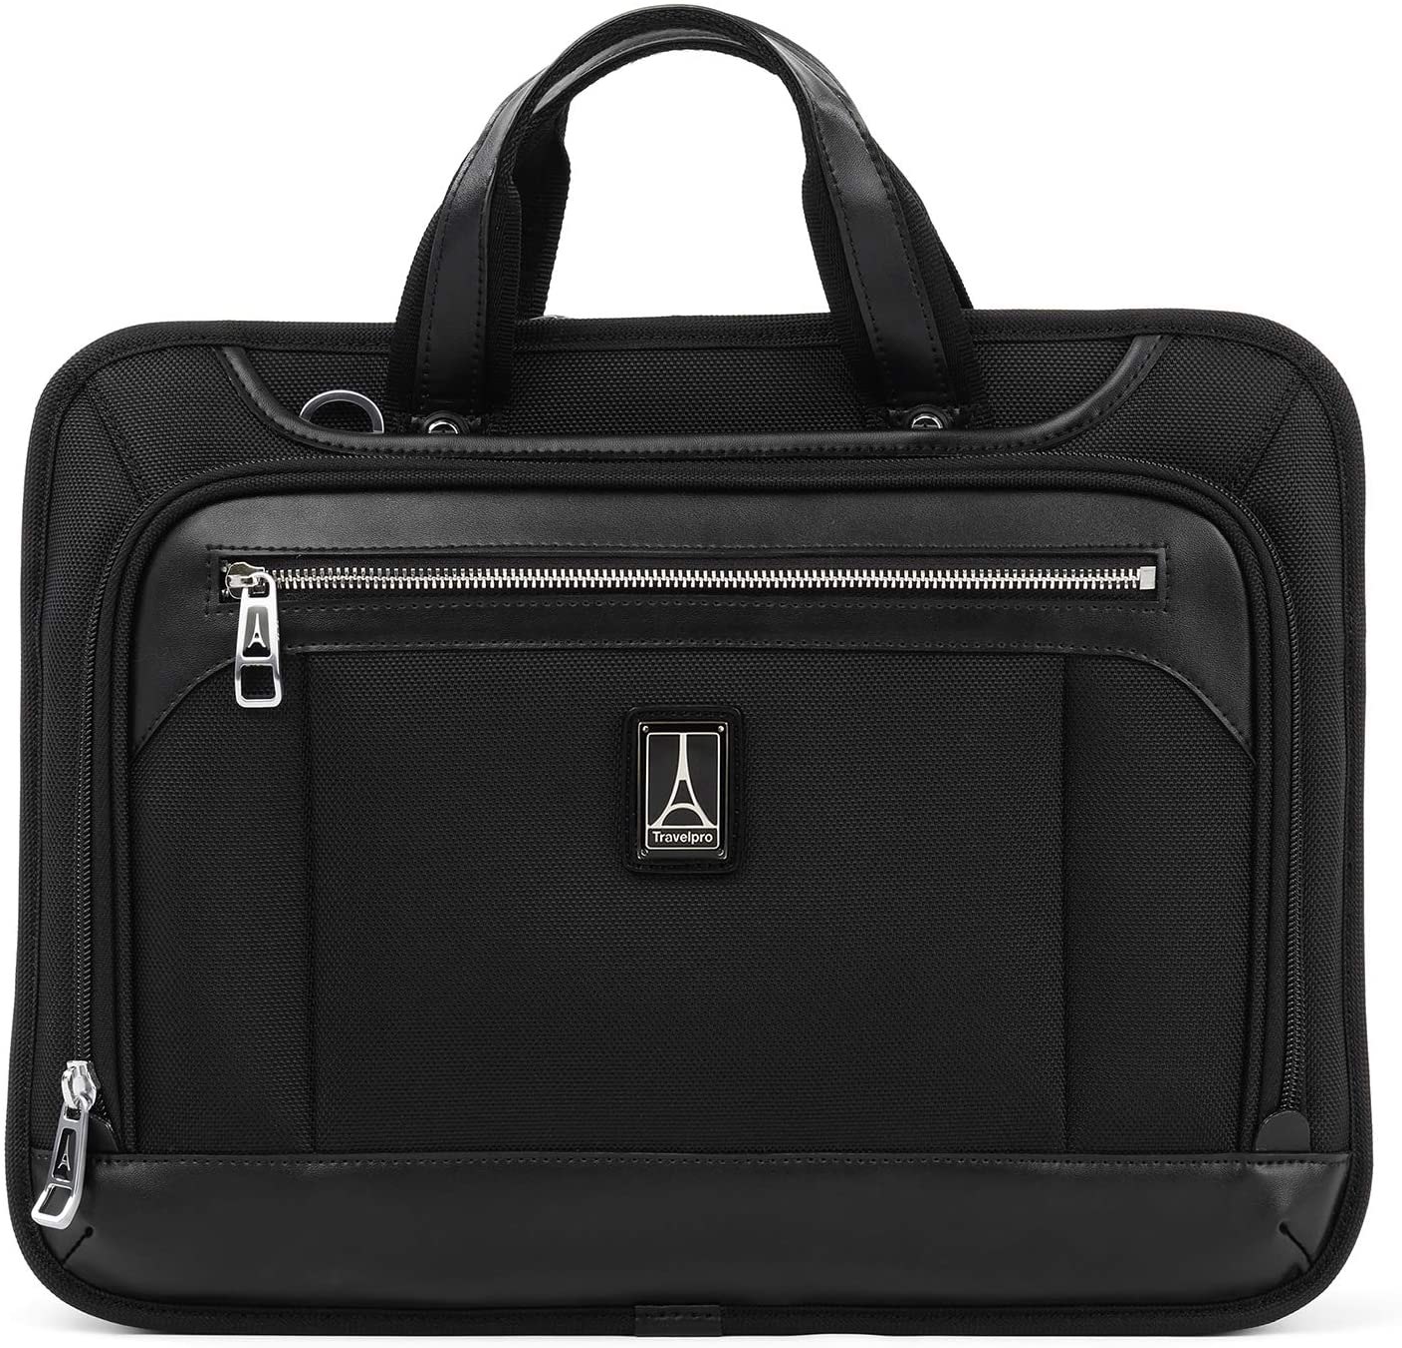 Travelpro Platinum Elite-Slim Business Laptop Briefcase, Shadow Black, 16-Inch